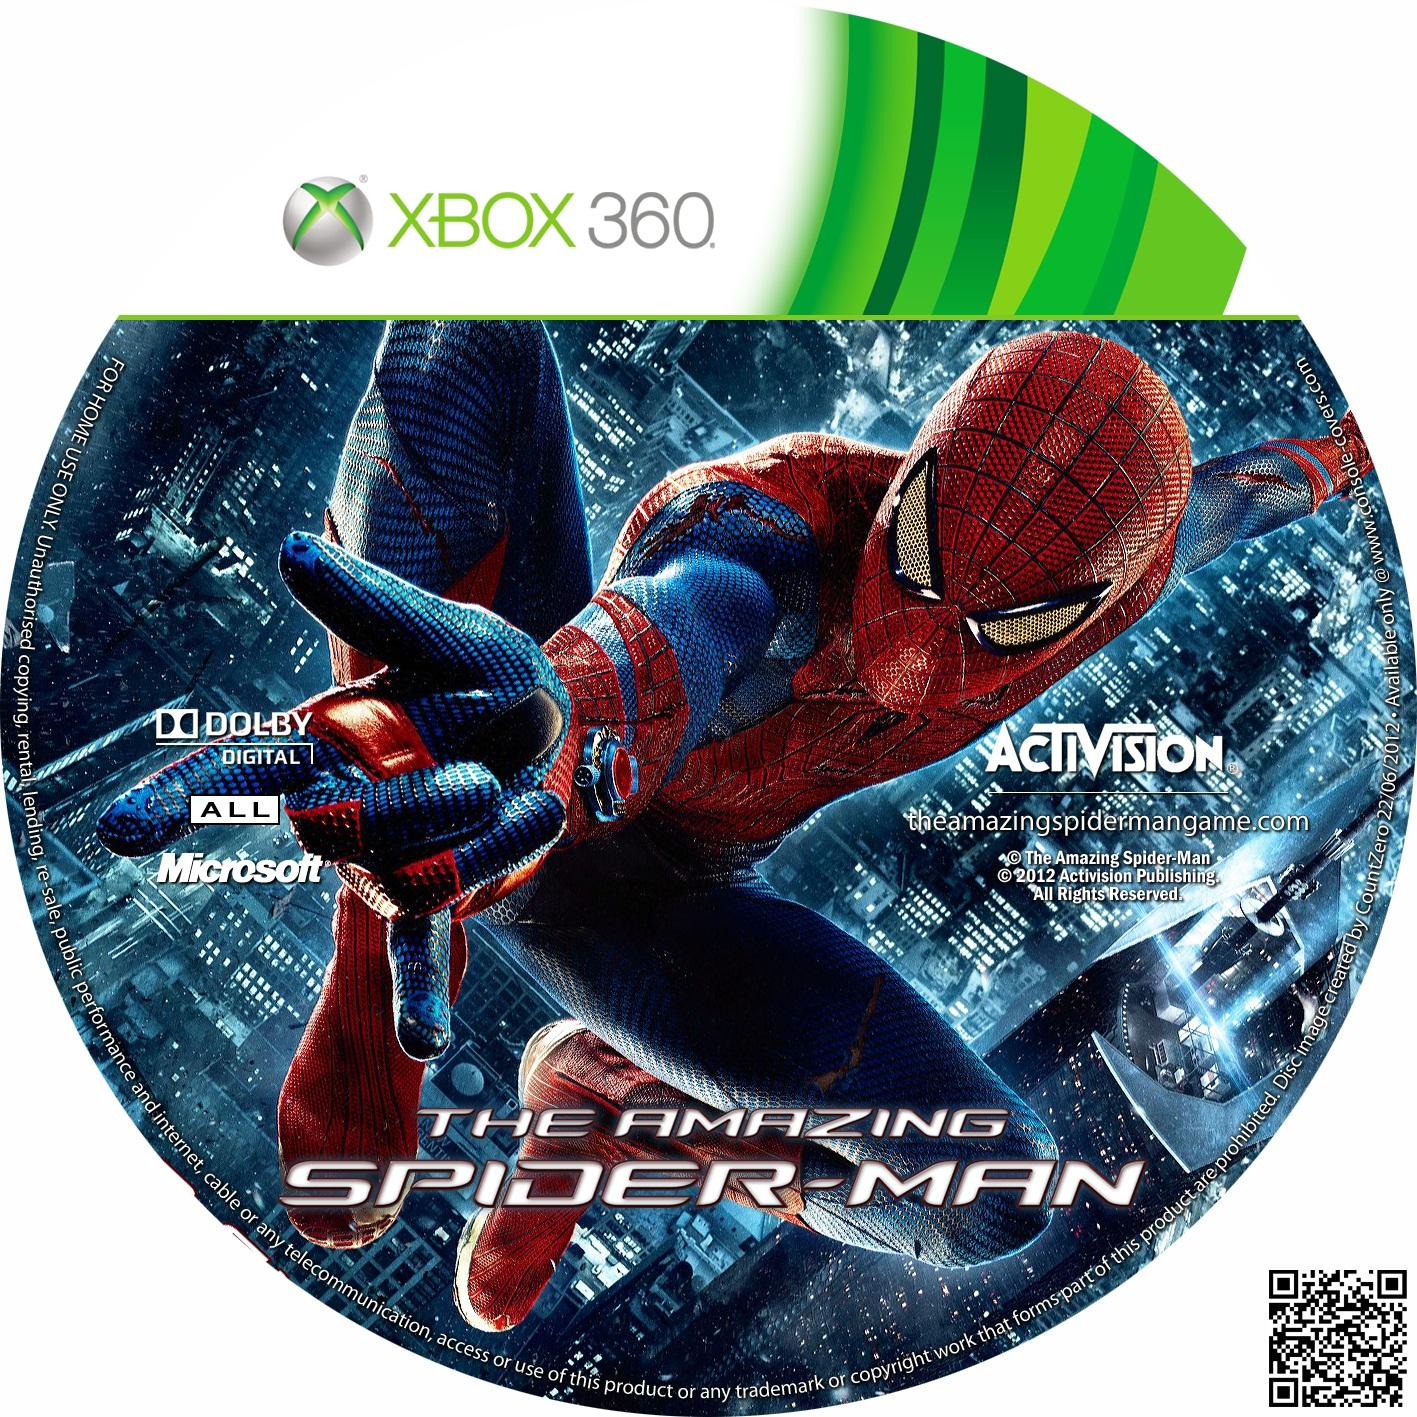 The Amazing Spider Man Game Xbox 360 Gamestop | cloudfilescv